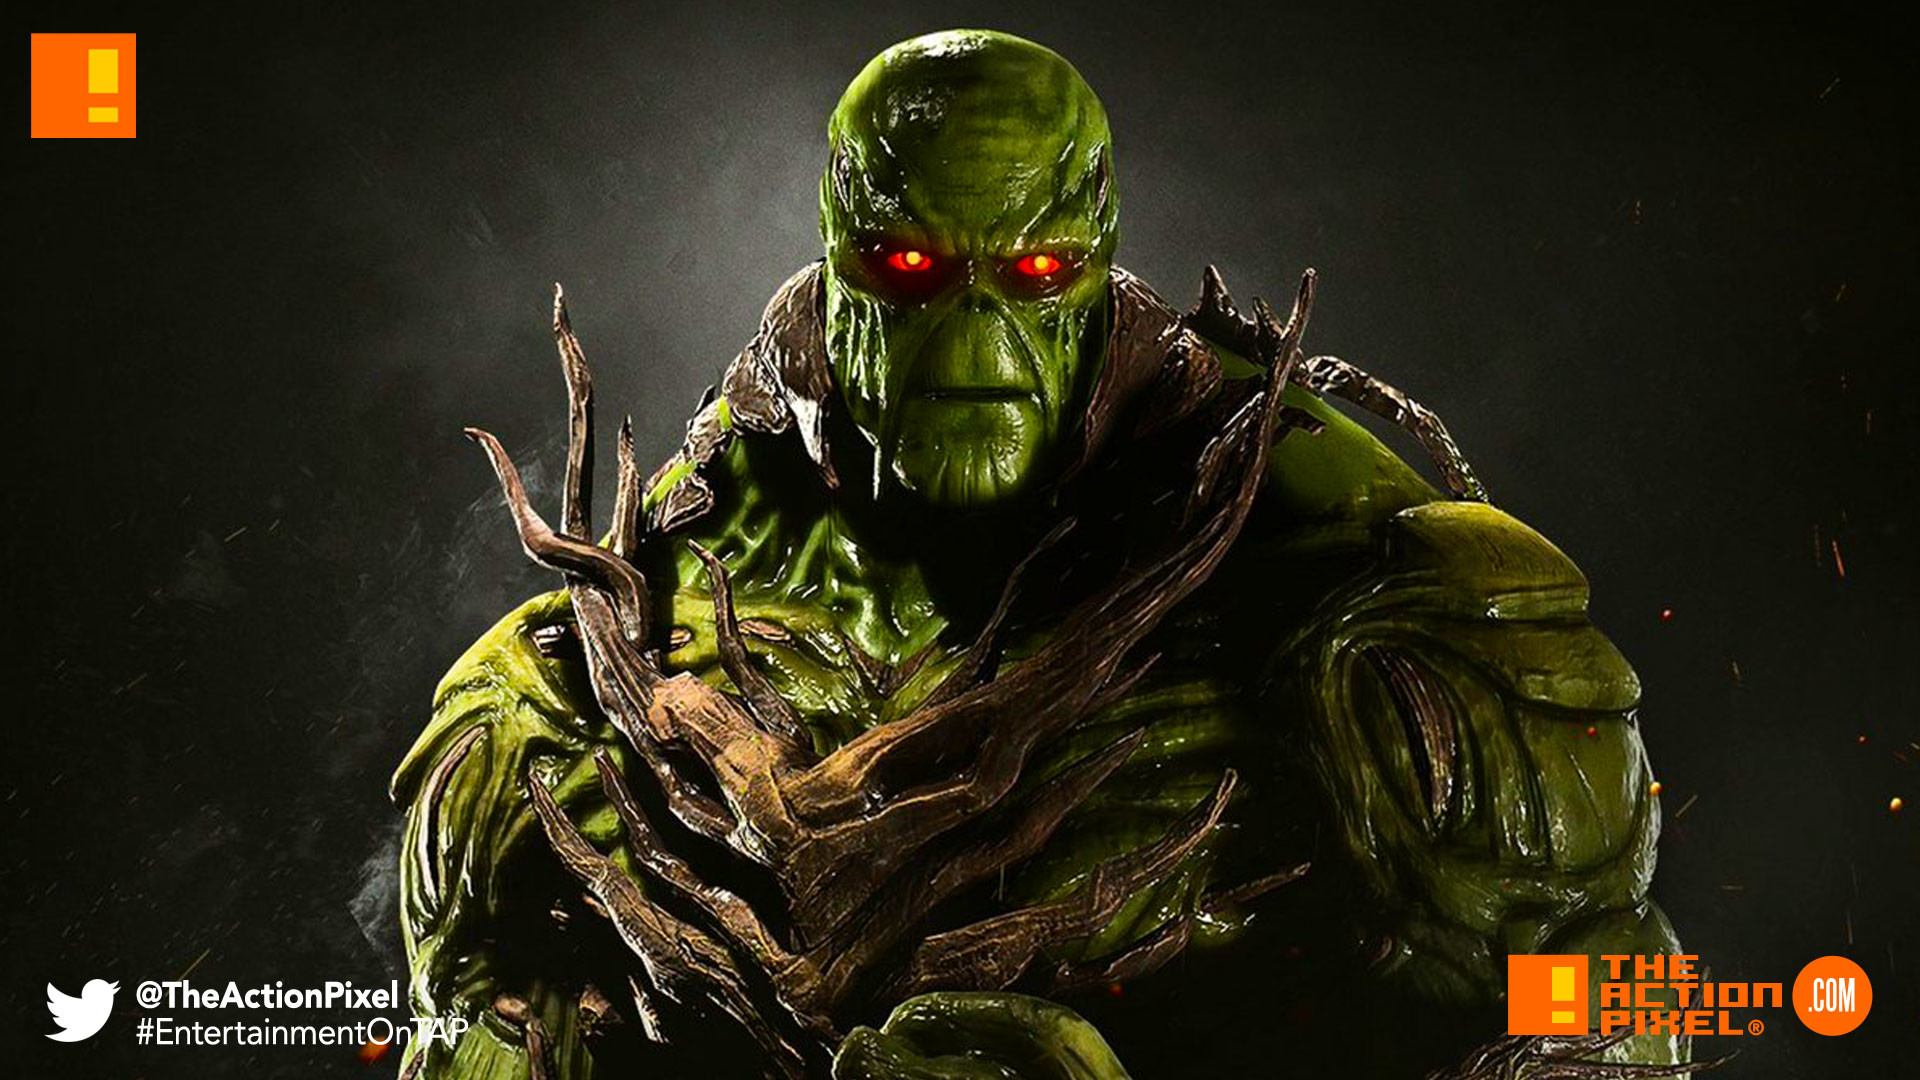 swamp thing, injustice 2, dc comics, wb games, warner bros.,